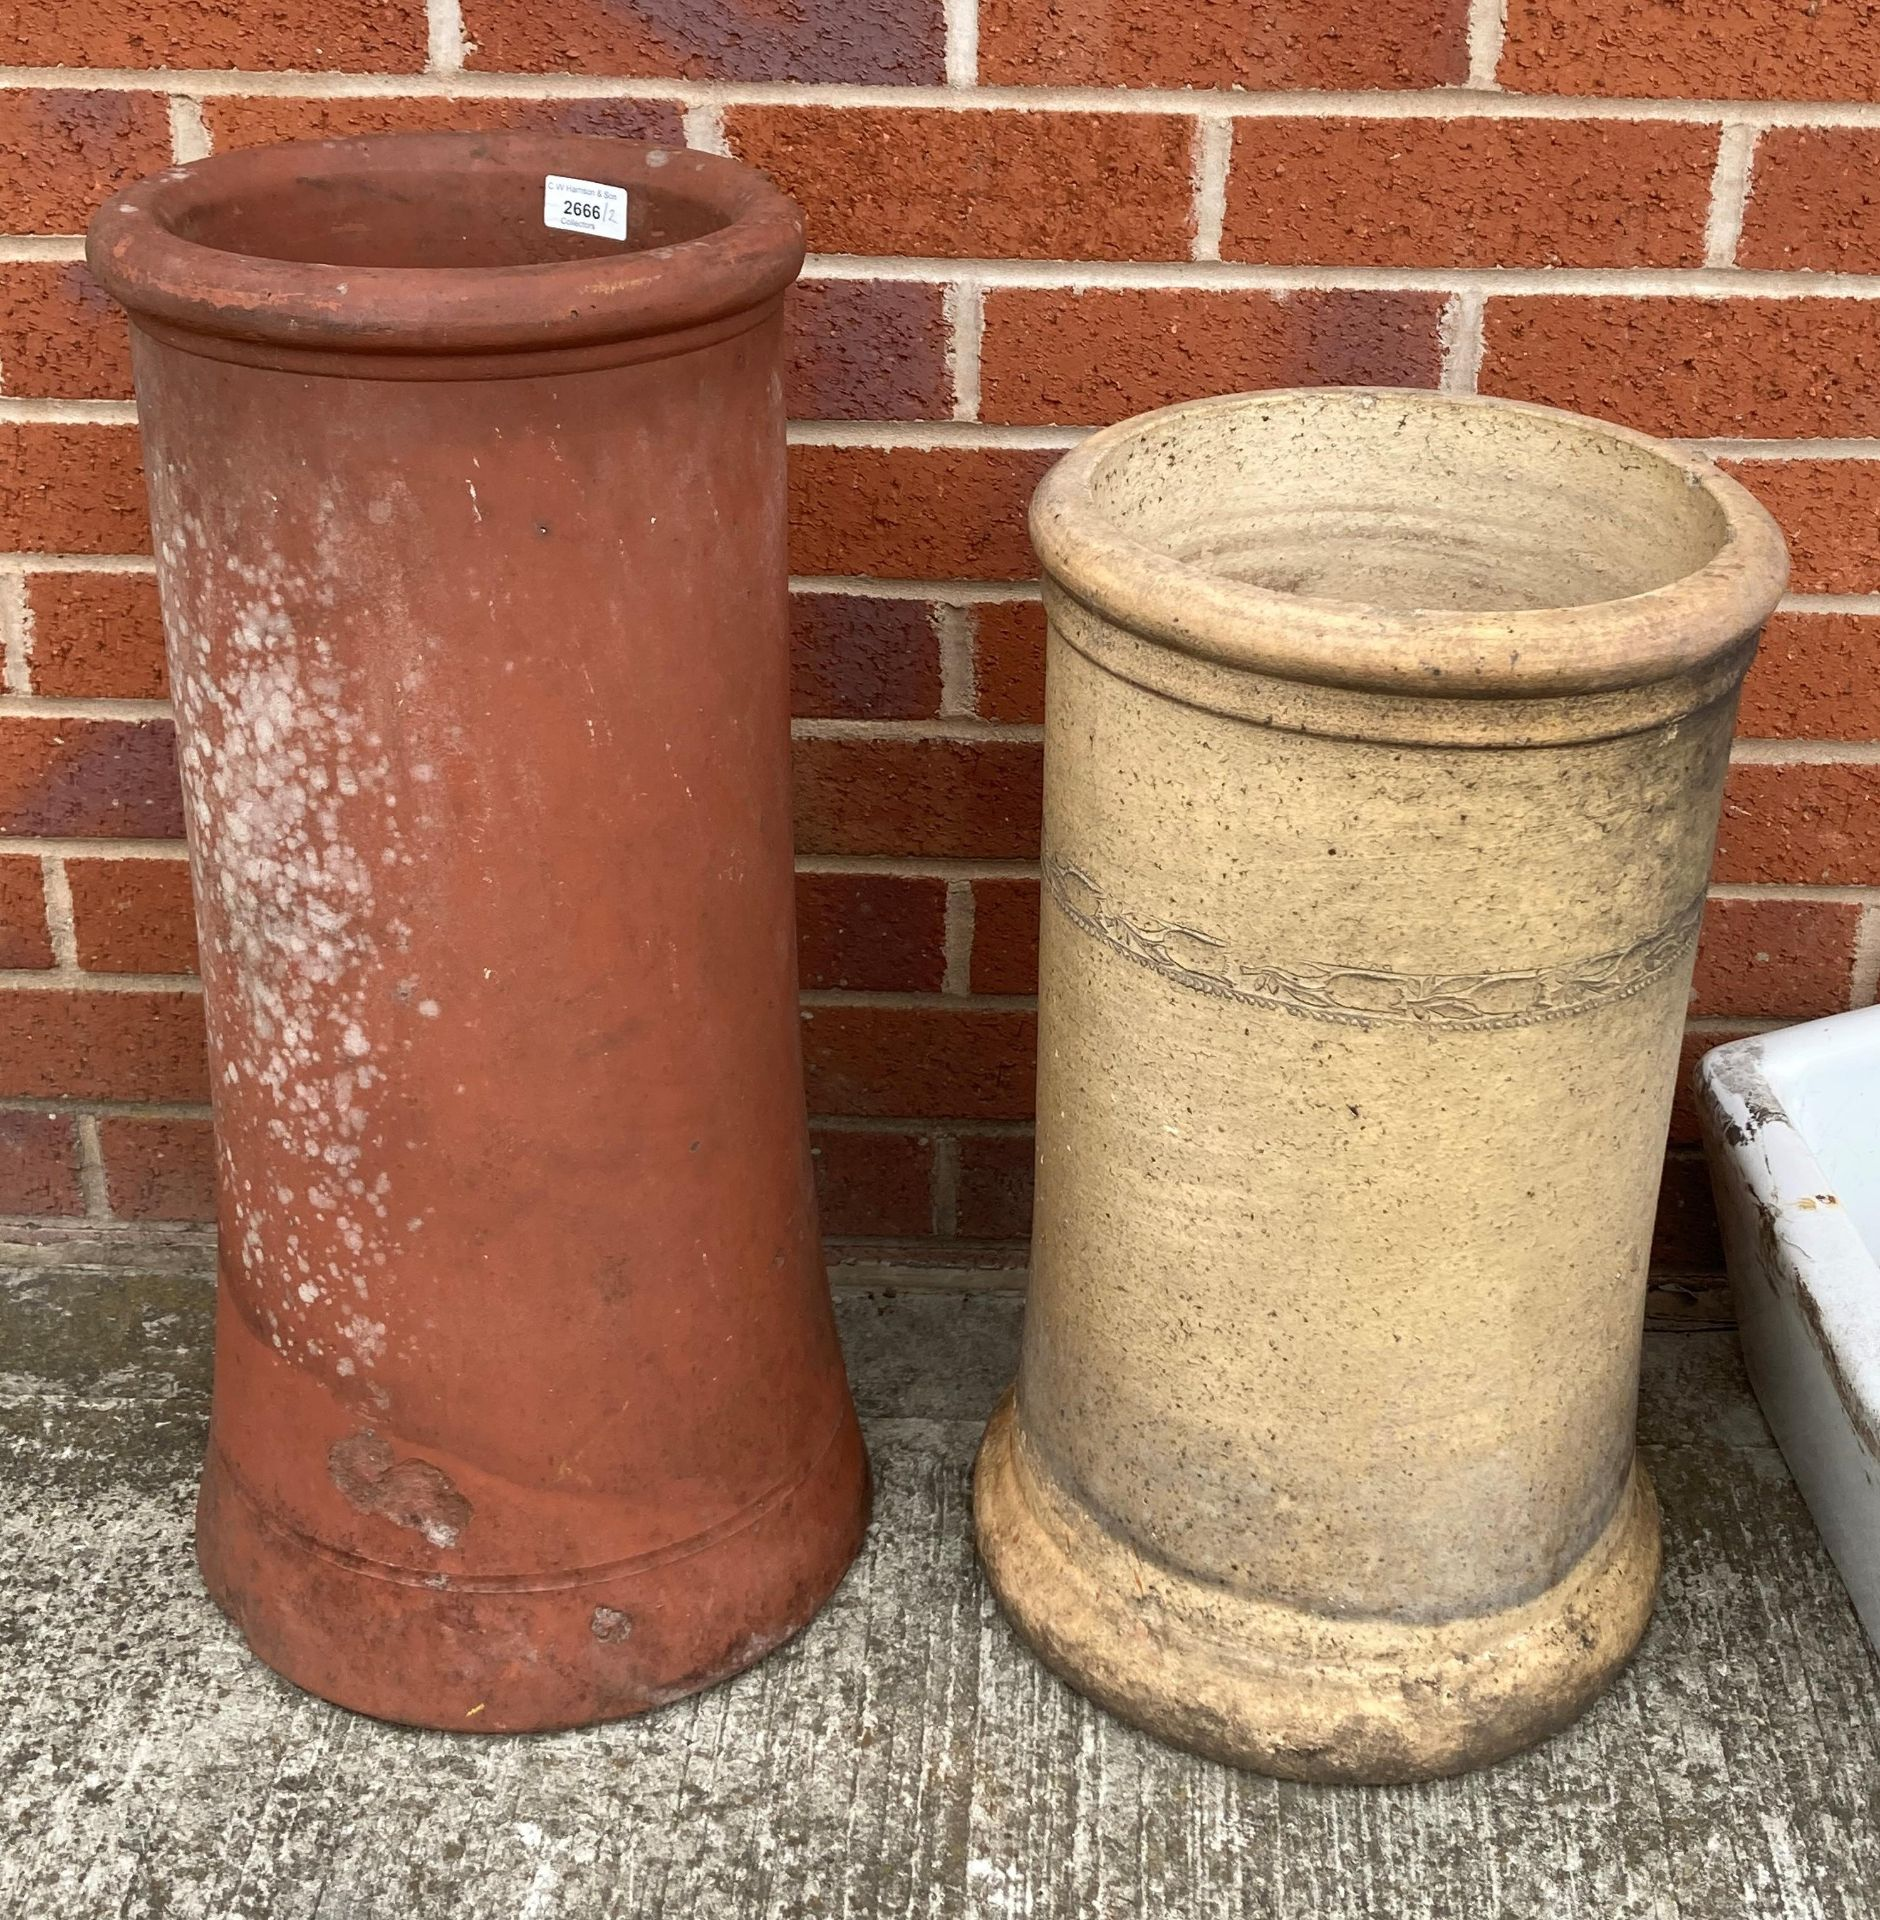 A terracotta chimney pot - damaged 62cm high and a cream earthenware chimney pot 52cm high